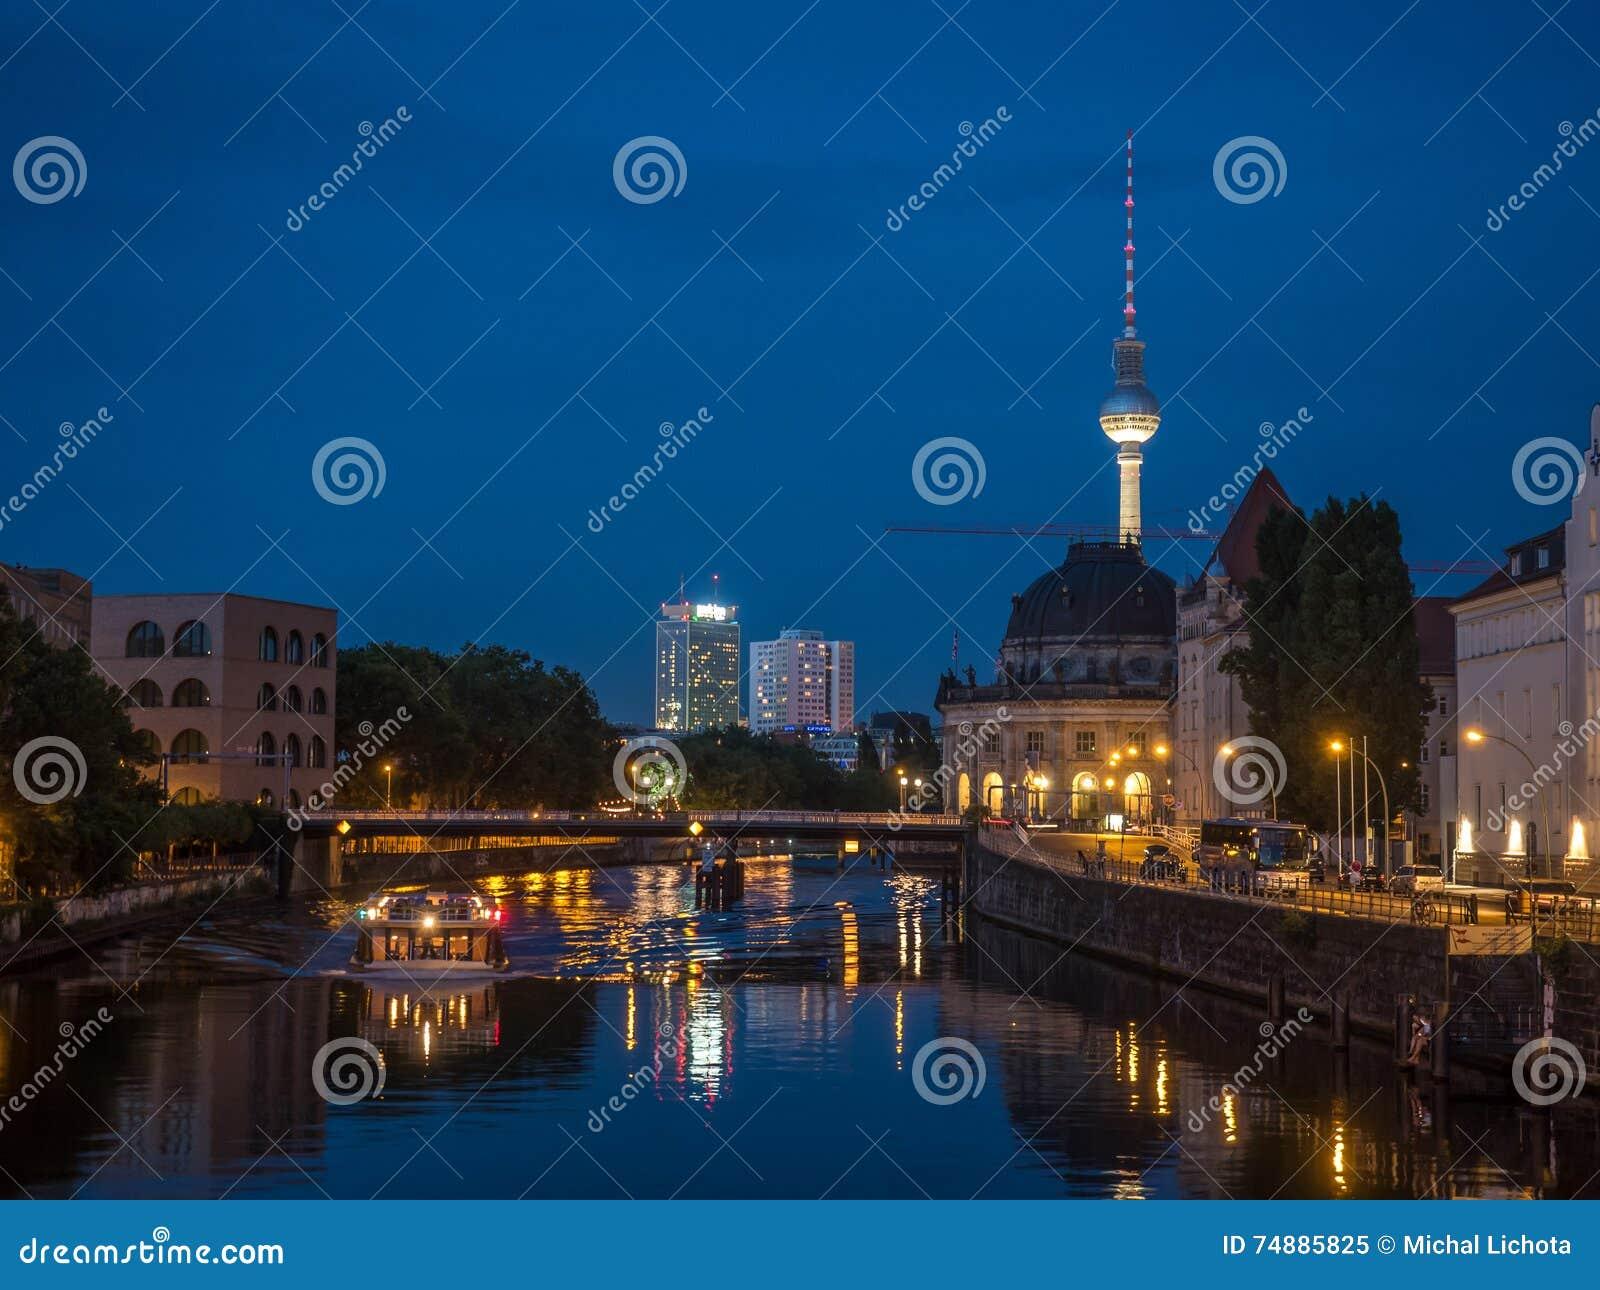 Berlino entro la notte